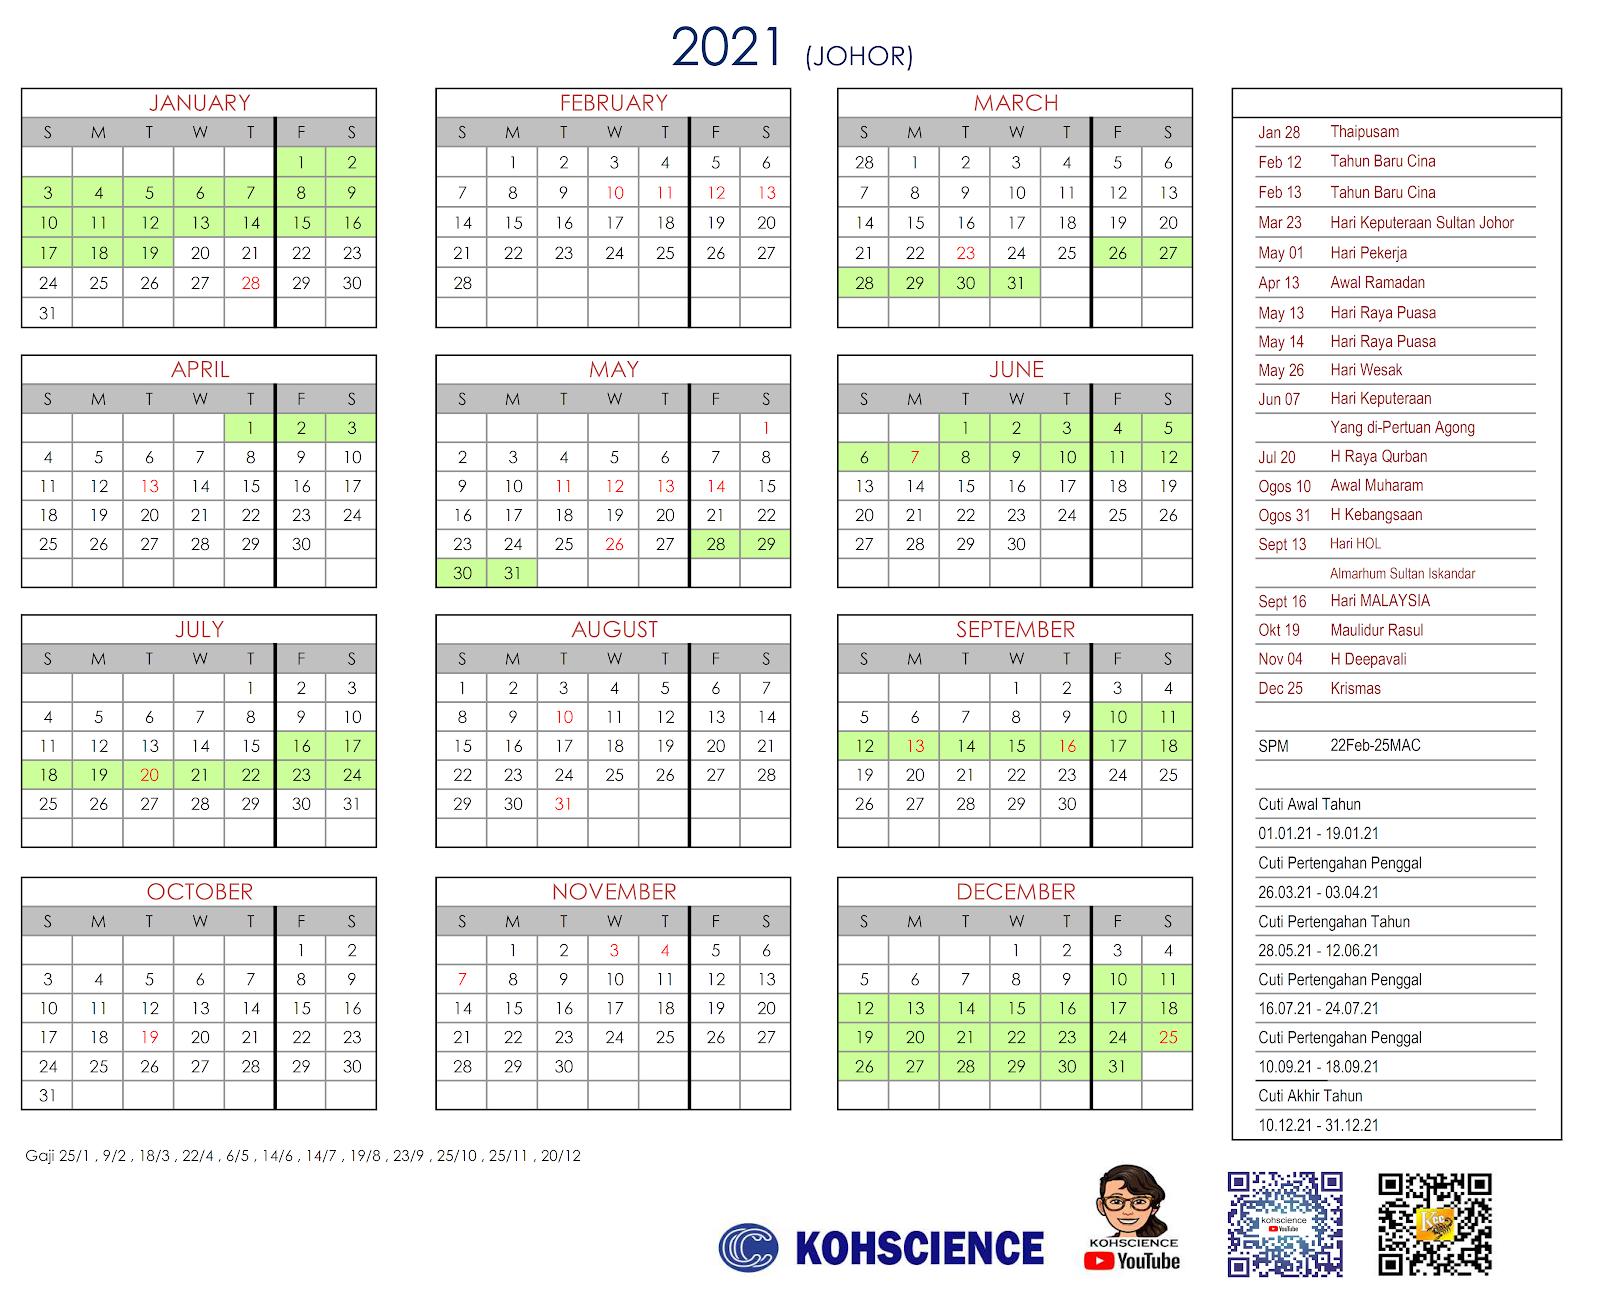 2021 Johor